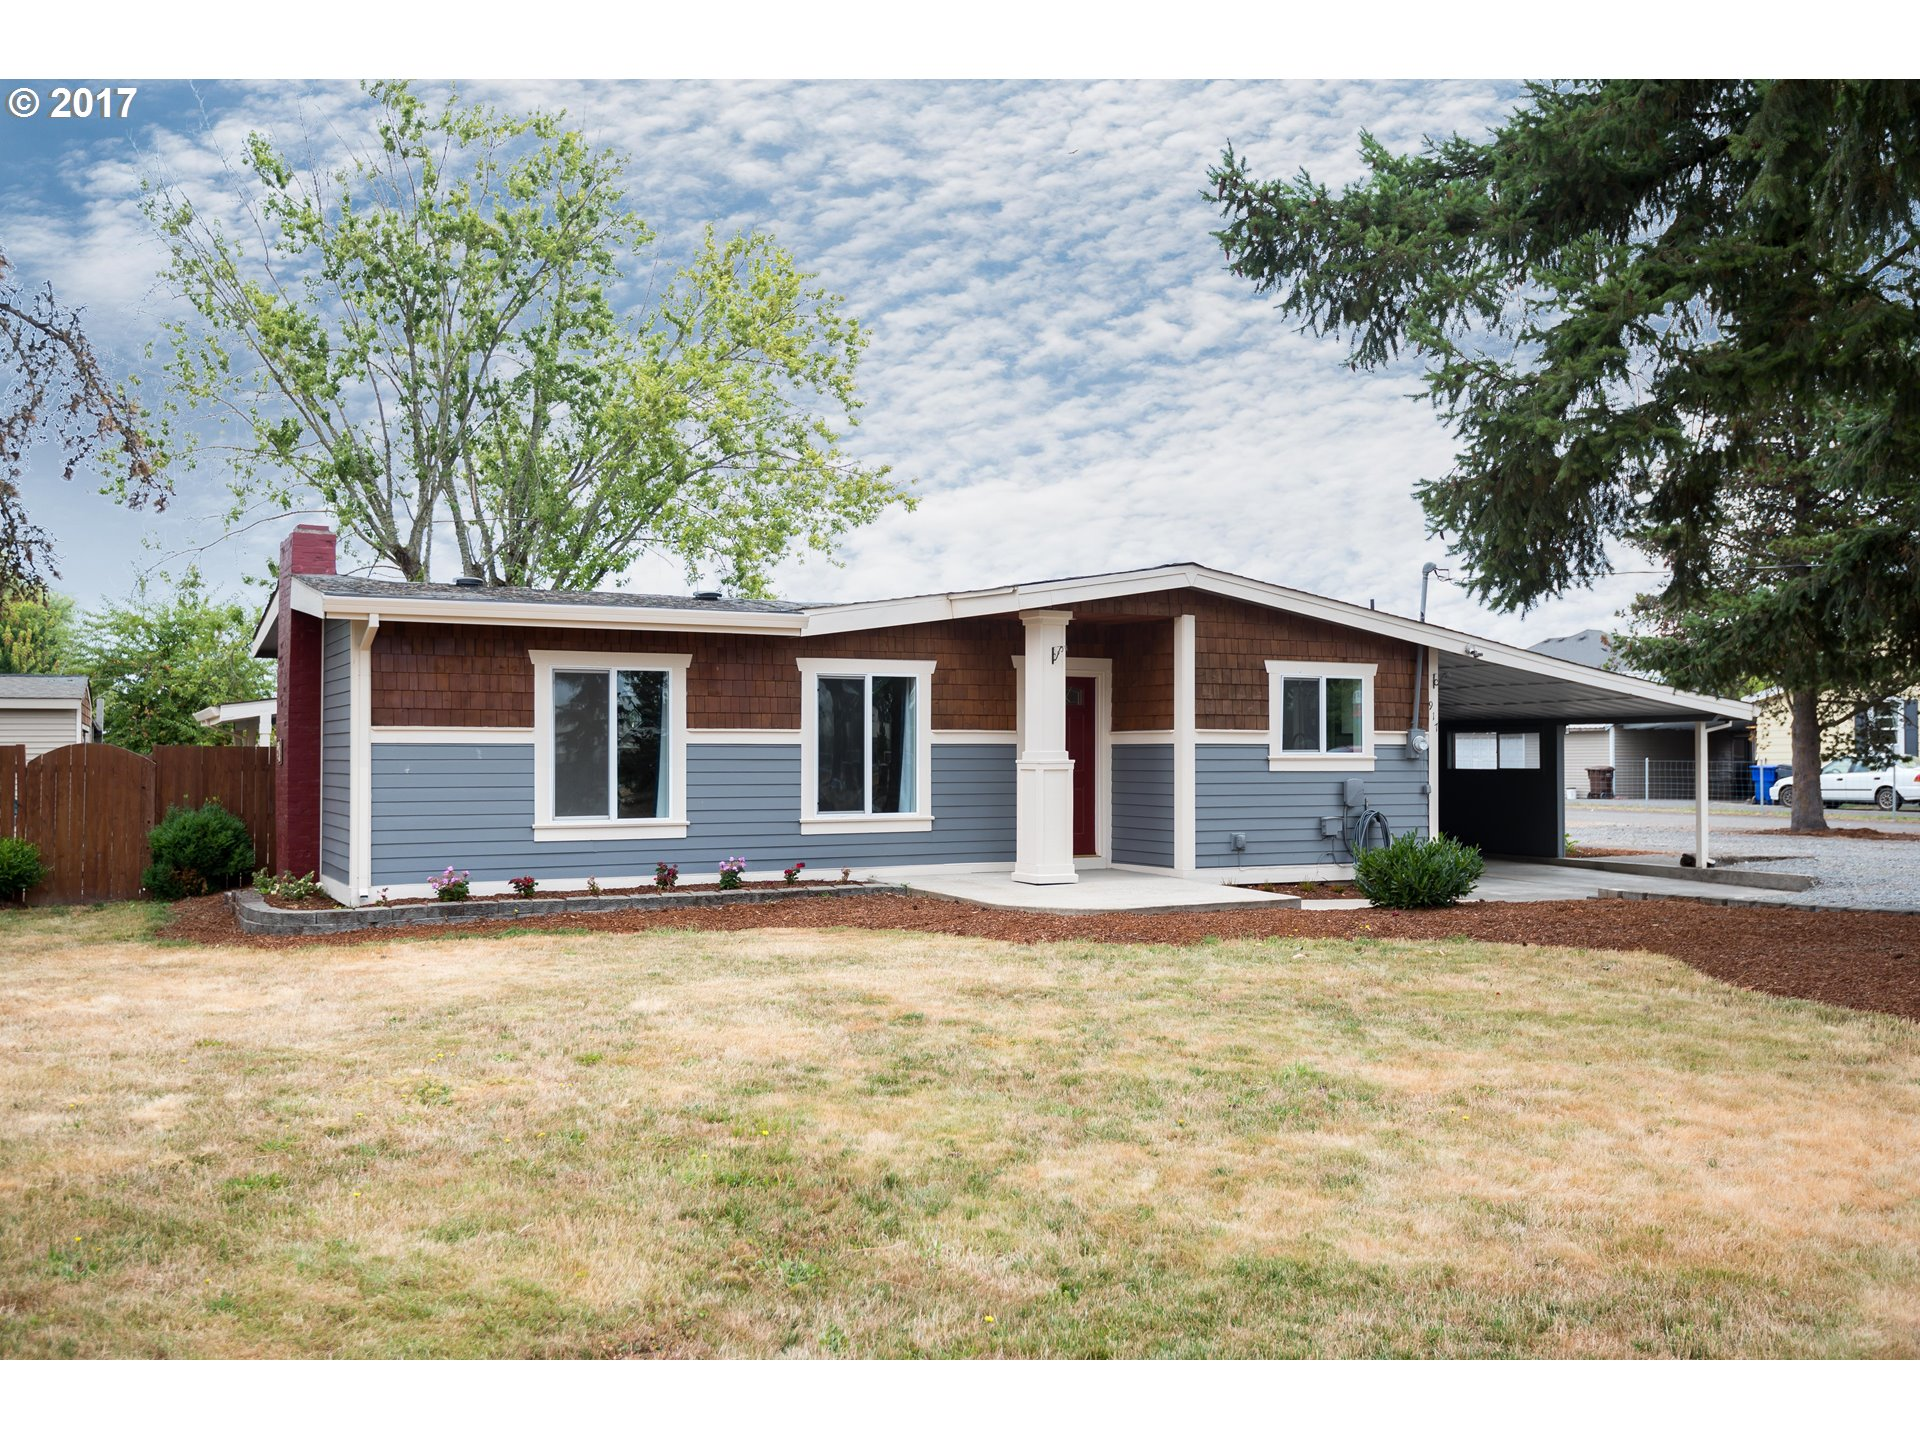 Molalla Ranch Built 1956